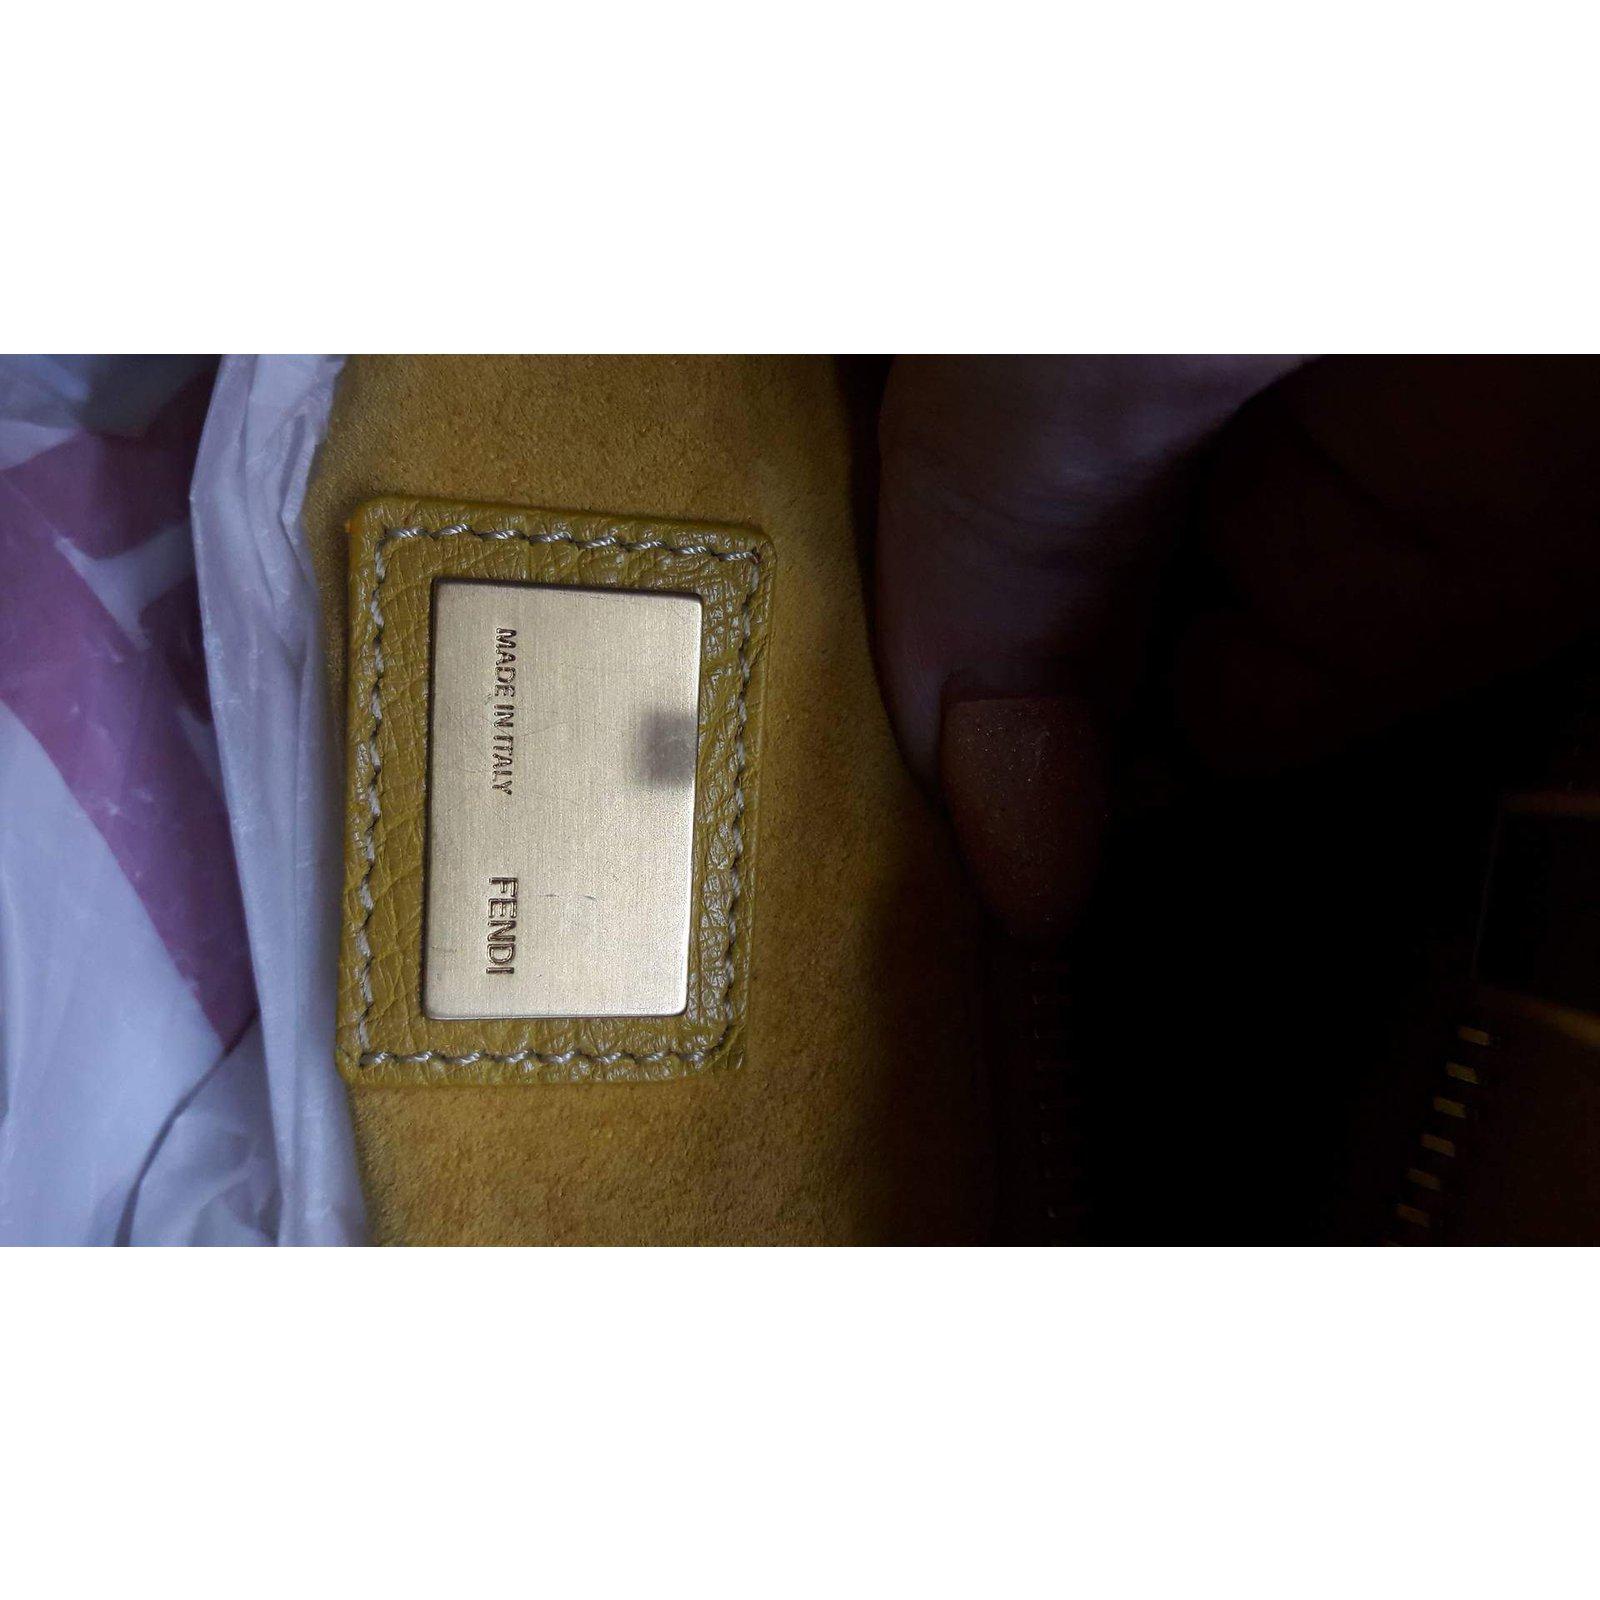 d94020e1c1d0 Fendi Ostrich Peekaboo Handbags Exotic leather Yellow ref.62950 - Joli  Closet